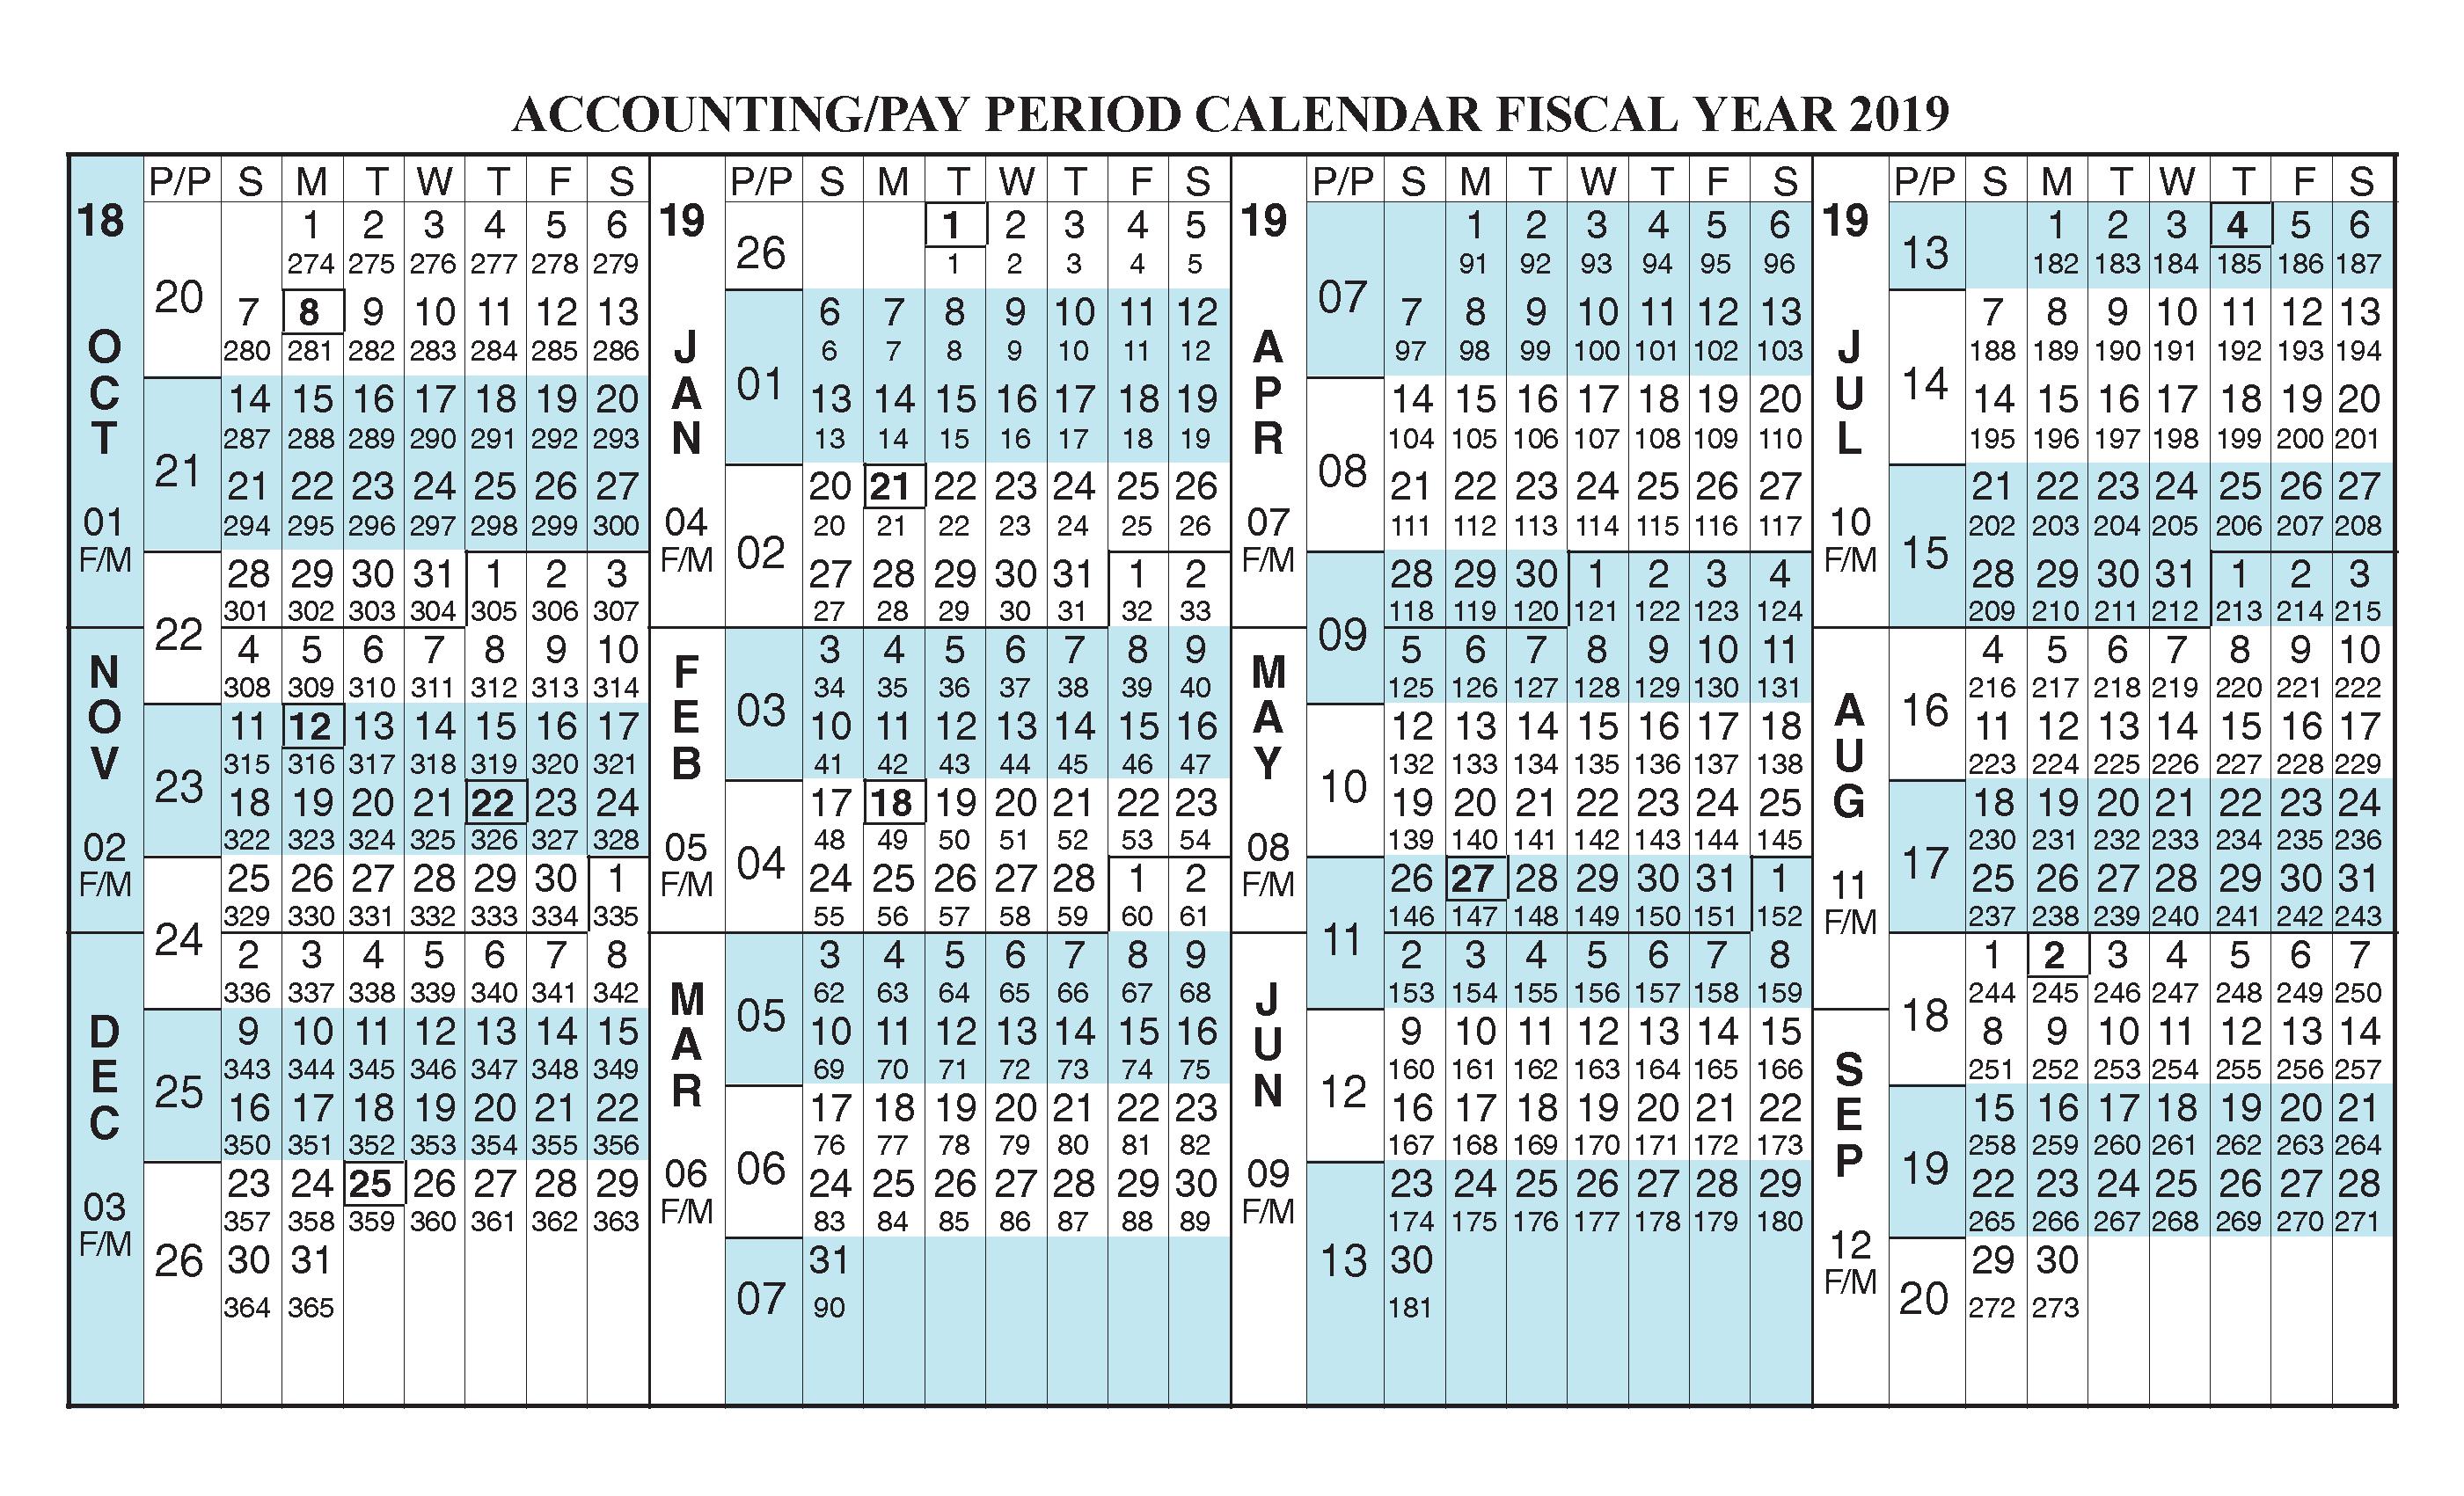 Federal Fiscal Year 2019 Calendar Payroll Calendar 2019 Fiscal Year Calendar [ Oct 2018   Sep 2019